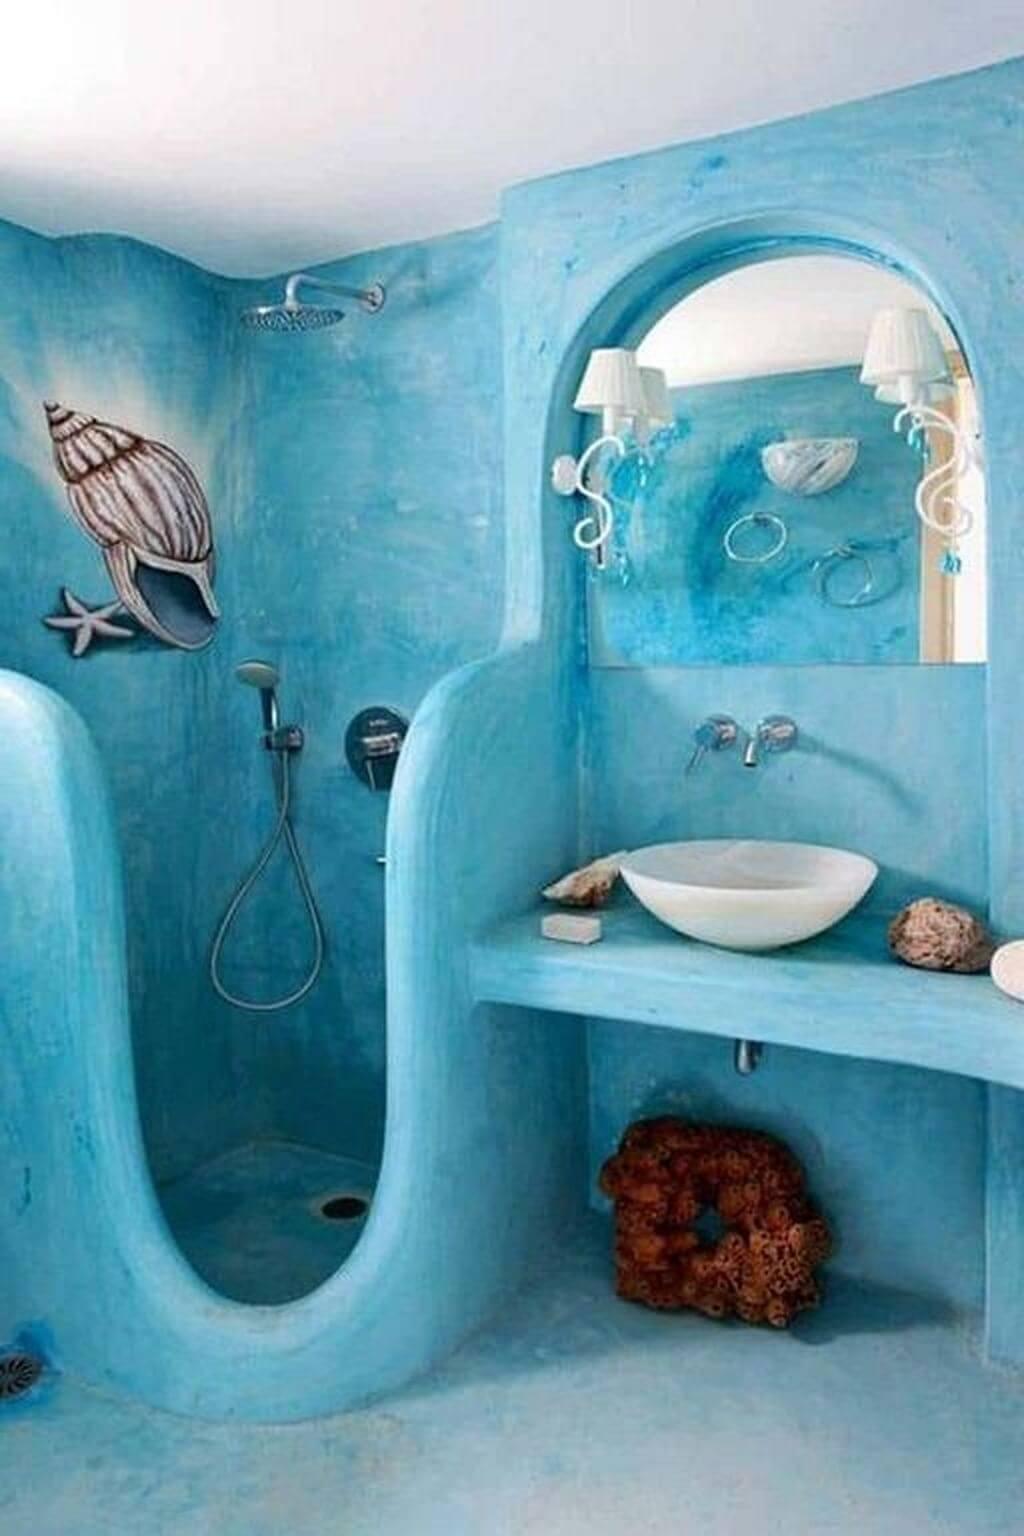 Fantastiskt sjöjungfru badrum